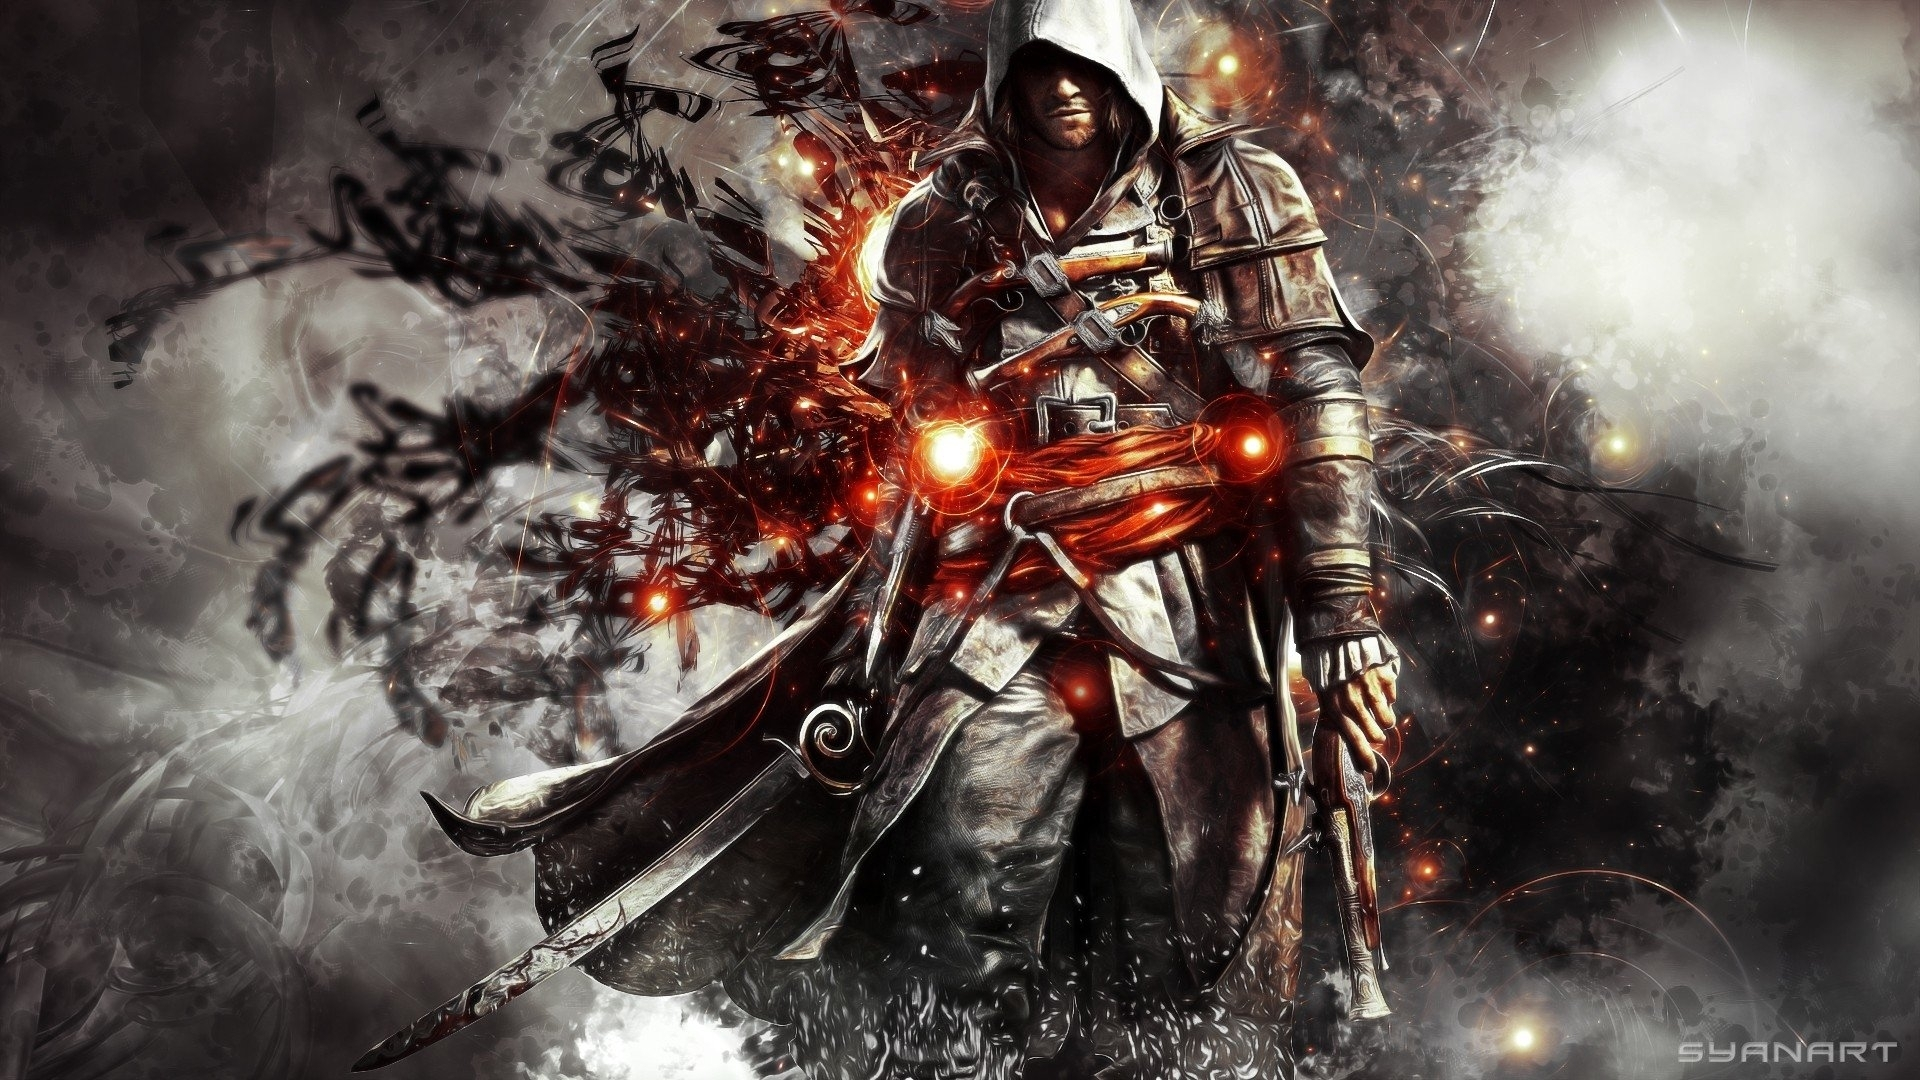 assassin's creed iv: black flag full hd fond d'écran and arrière